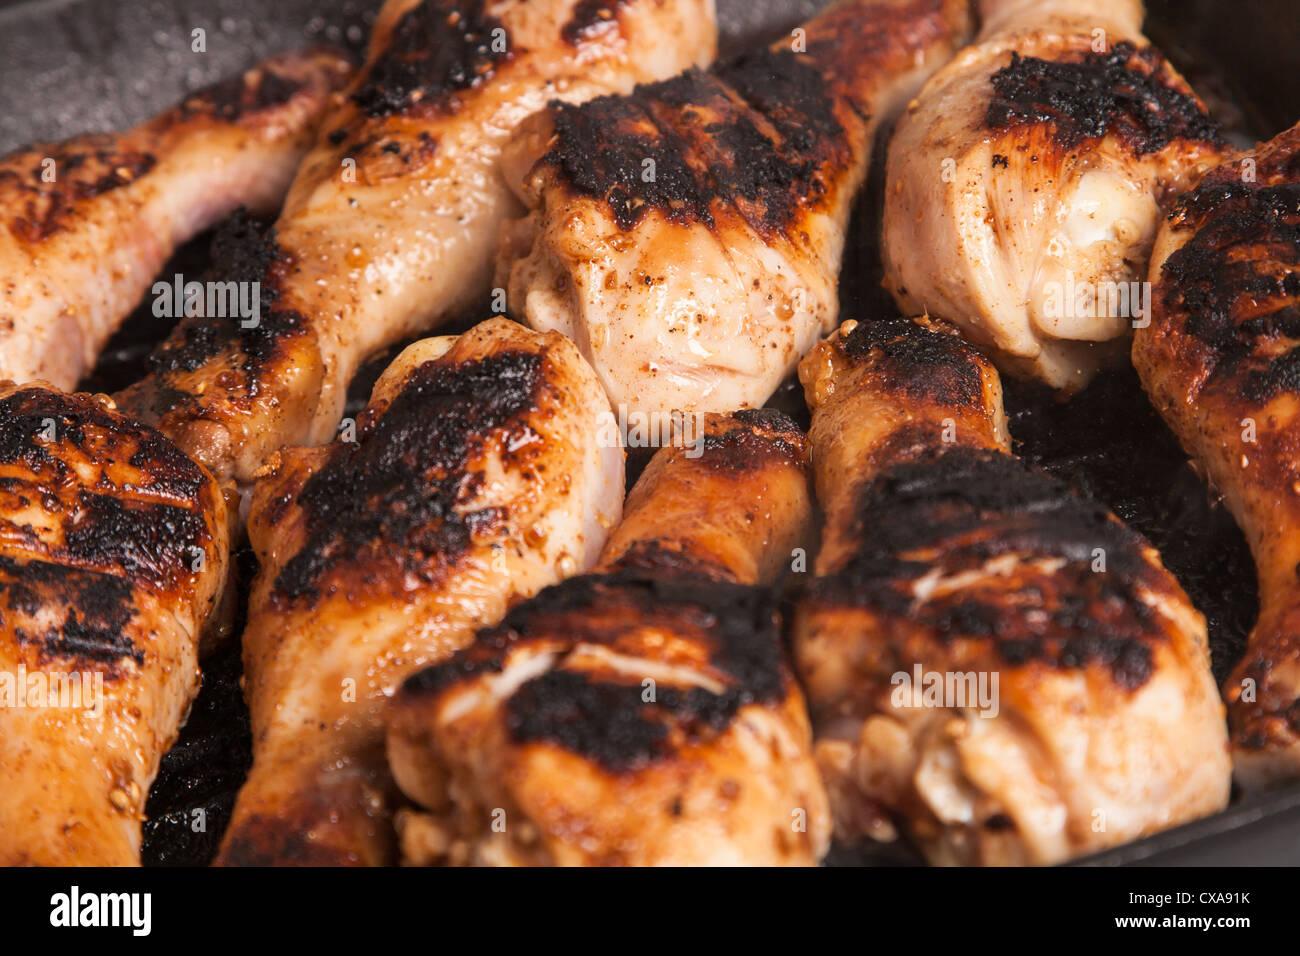 some juicy roast chicken drumstick on frying pan - Stock Image